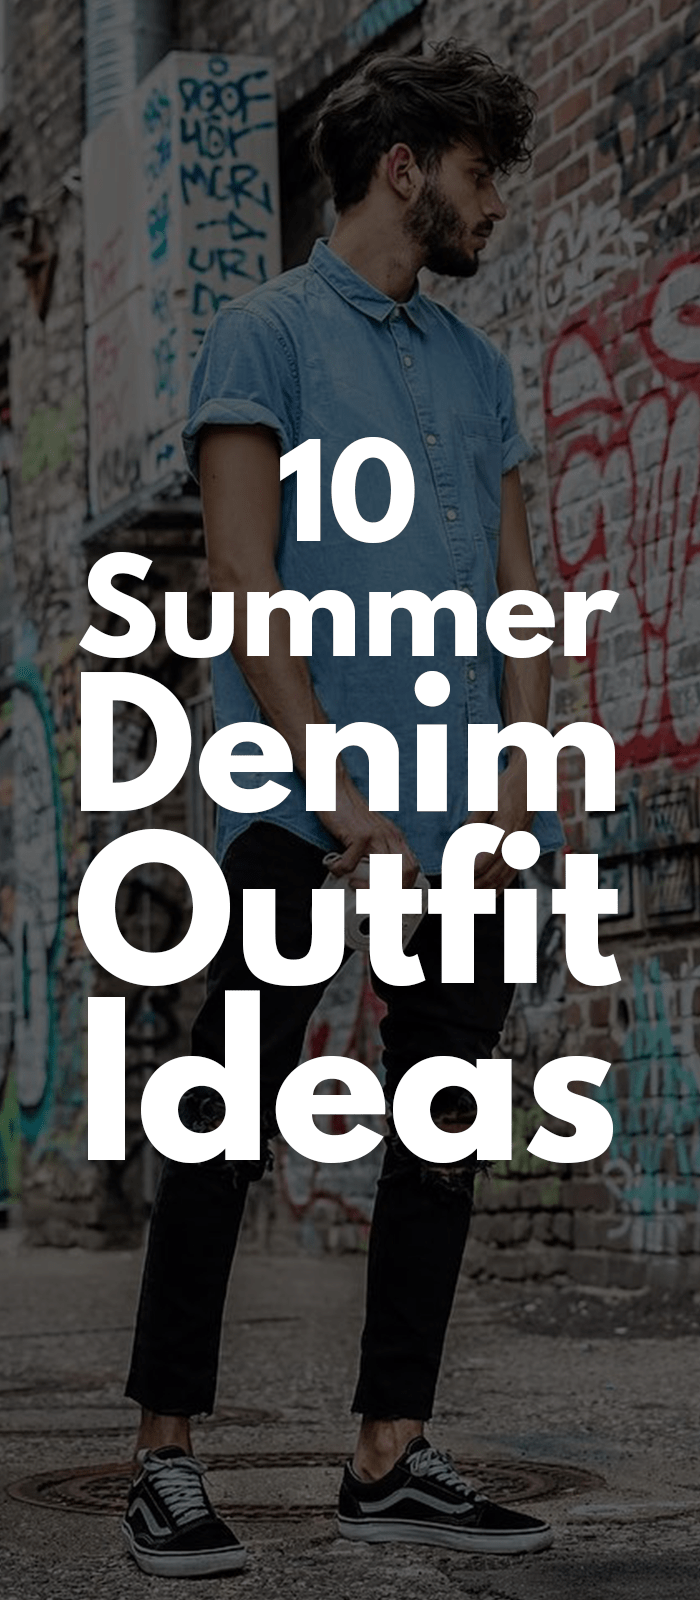 25f02fabdd4a 10 Summer Denim Outfit Ideas That Won t Make You Sweat